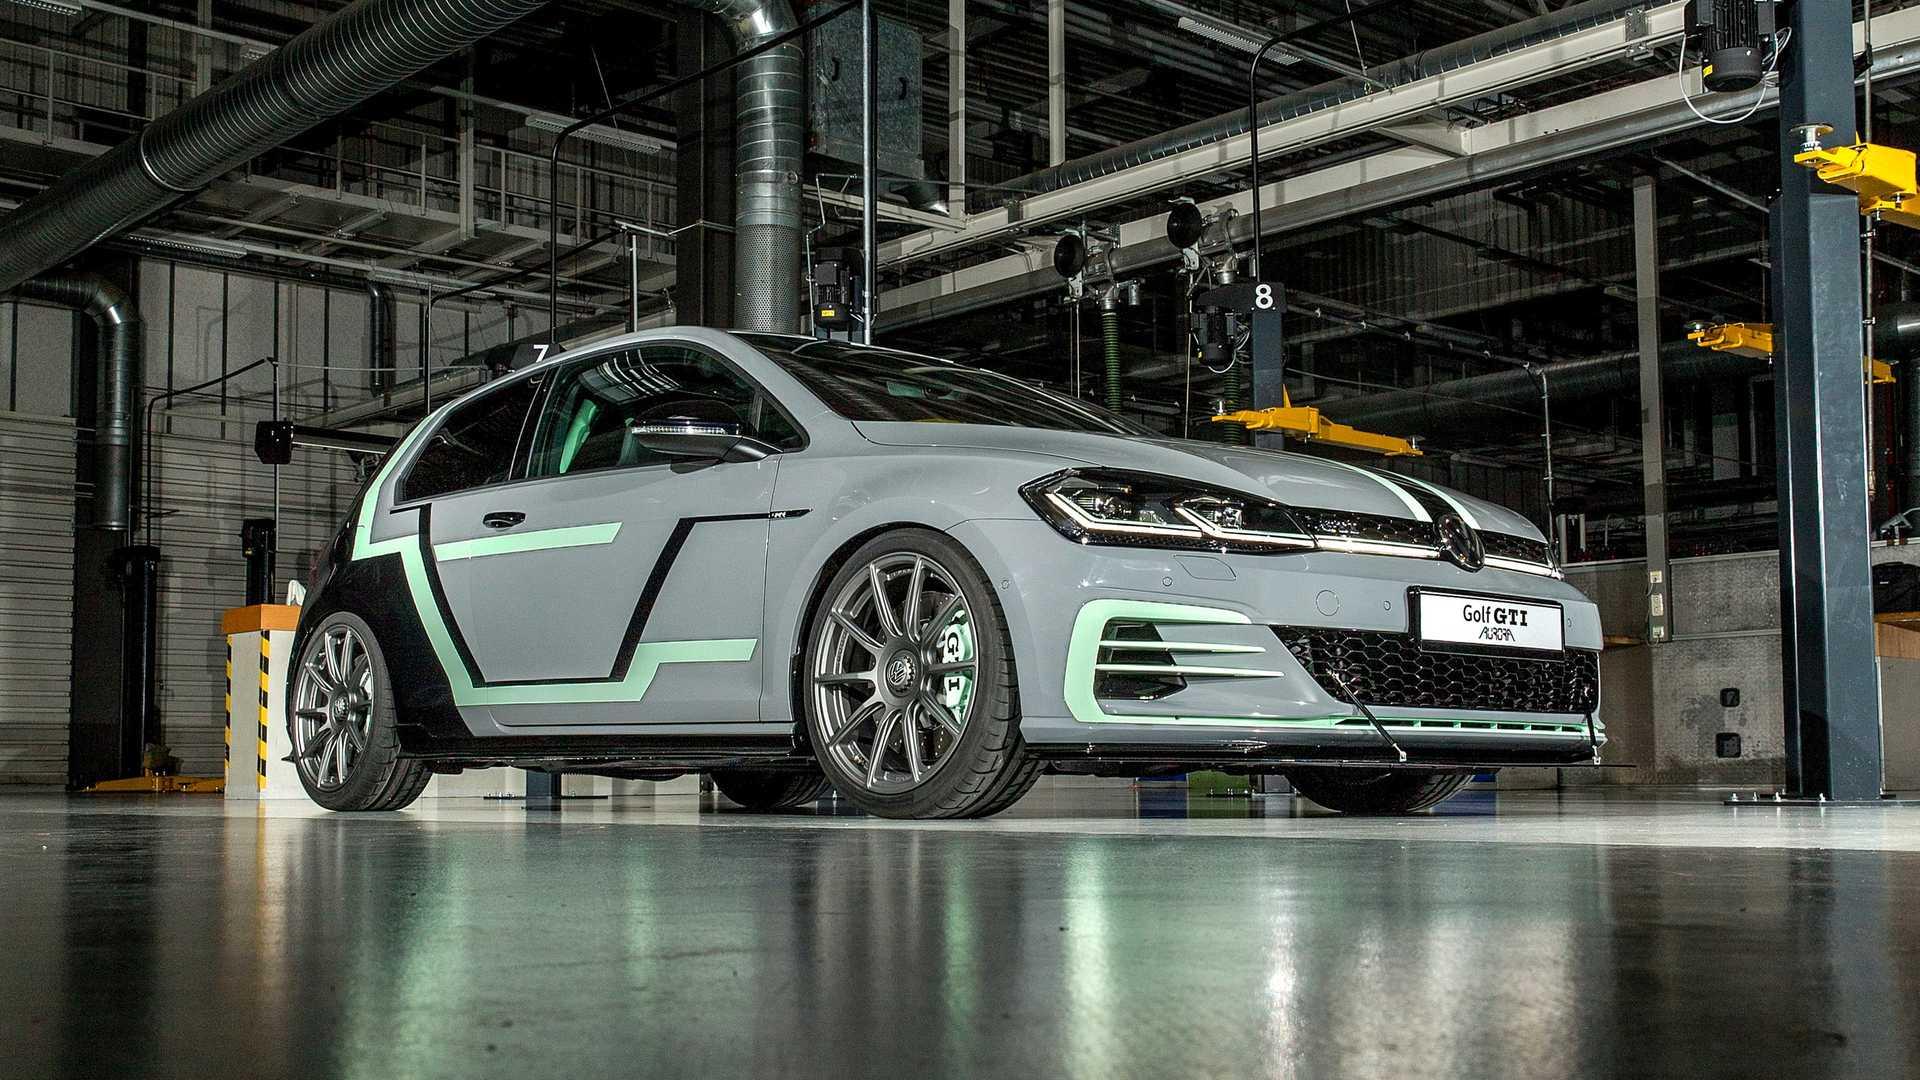 VW-Golf-GTI-Aurora-2